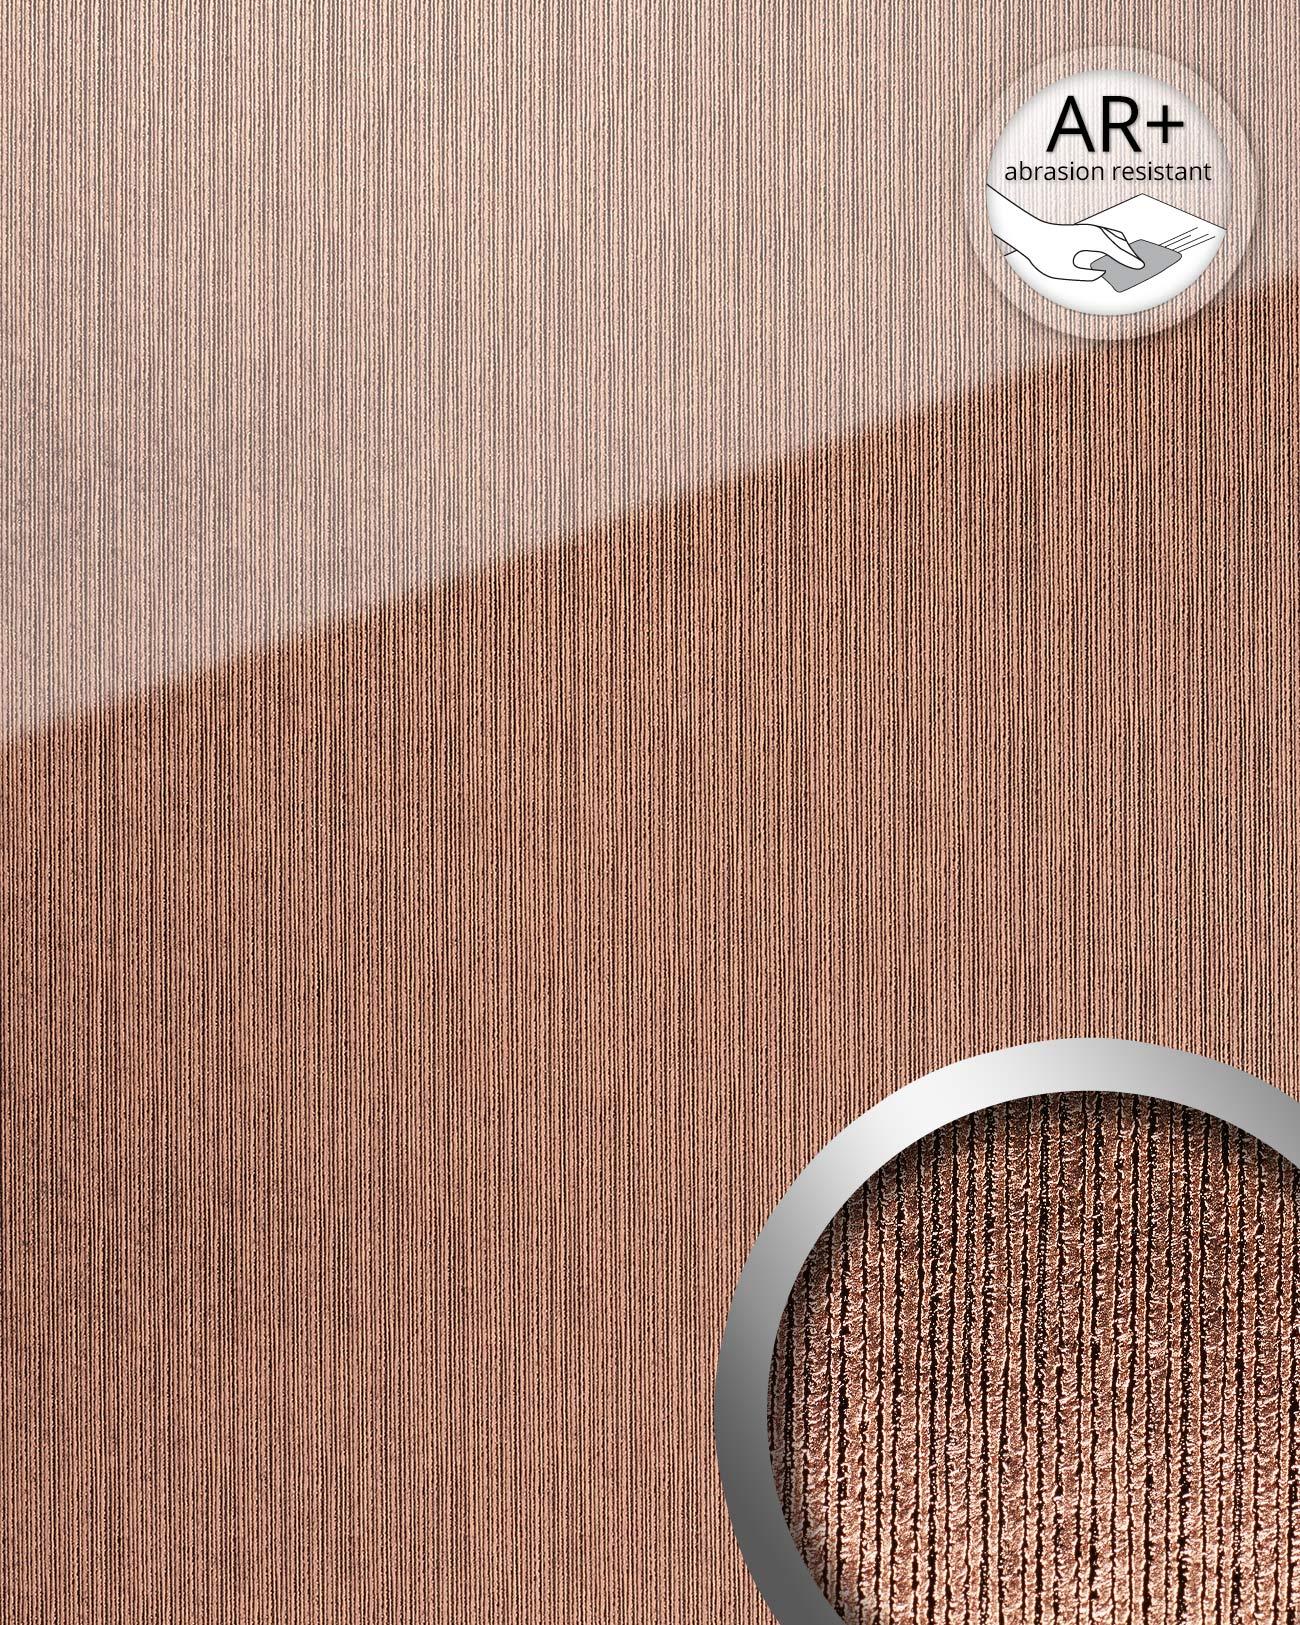 wandpaneel glas optik wallface 20217 aligned rose ar wandverkleidung glatt in hochglanz optik. Black Bedroom Furniture Sets. Home Design Ideas